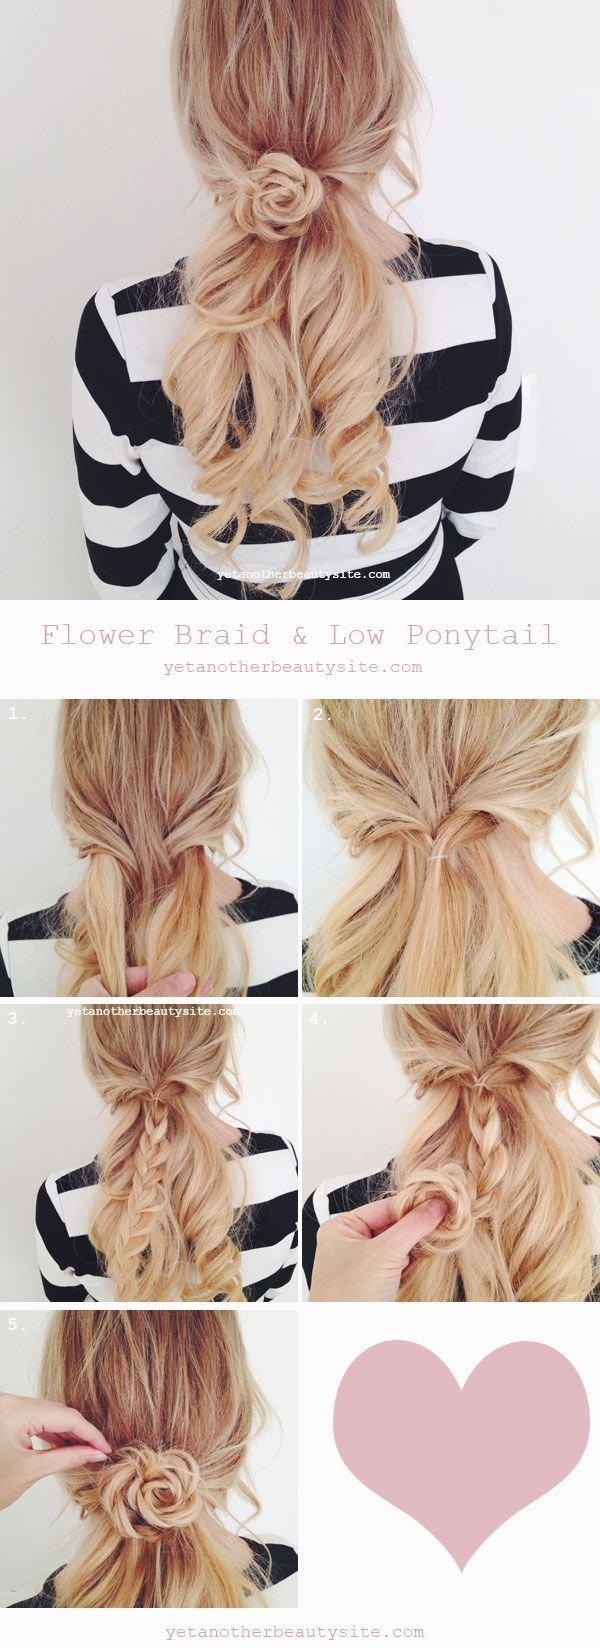 hair,hairstyle,hair coloring,blond,long hair,